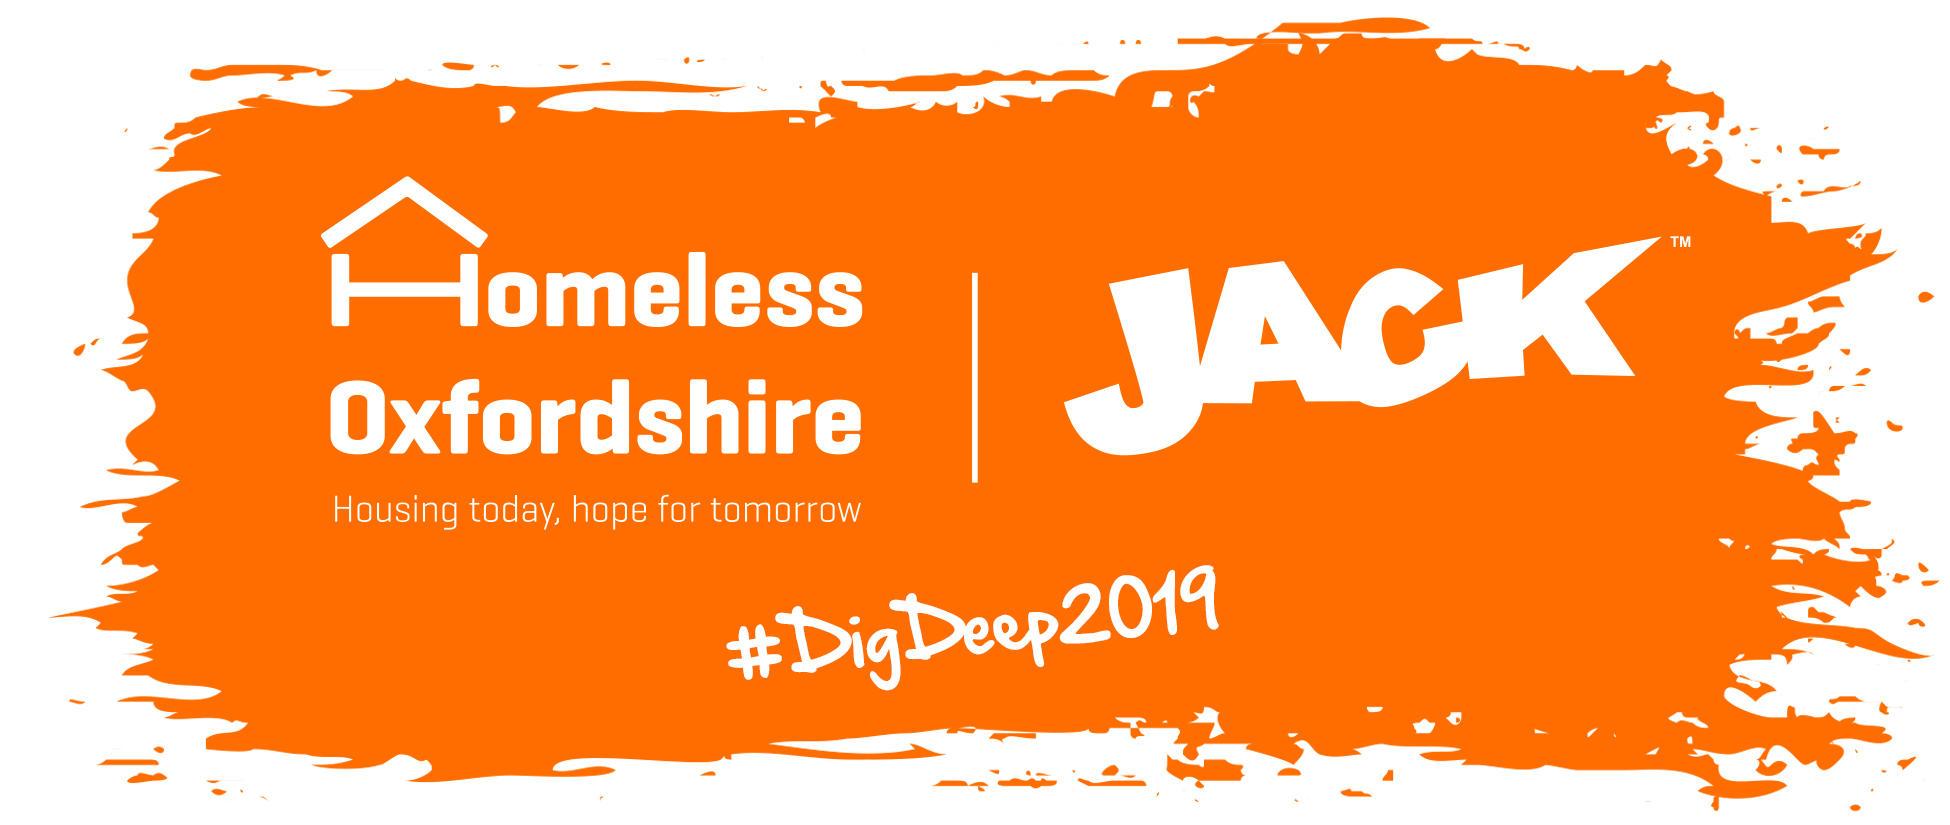 Homeless Oxfordshire & Jack 'Dig Deep 2019' logo